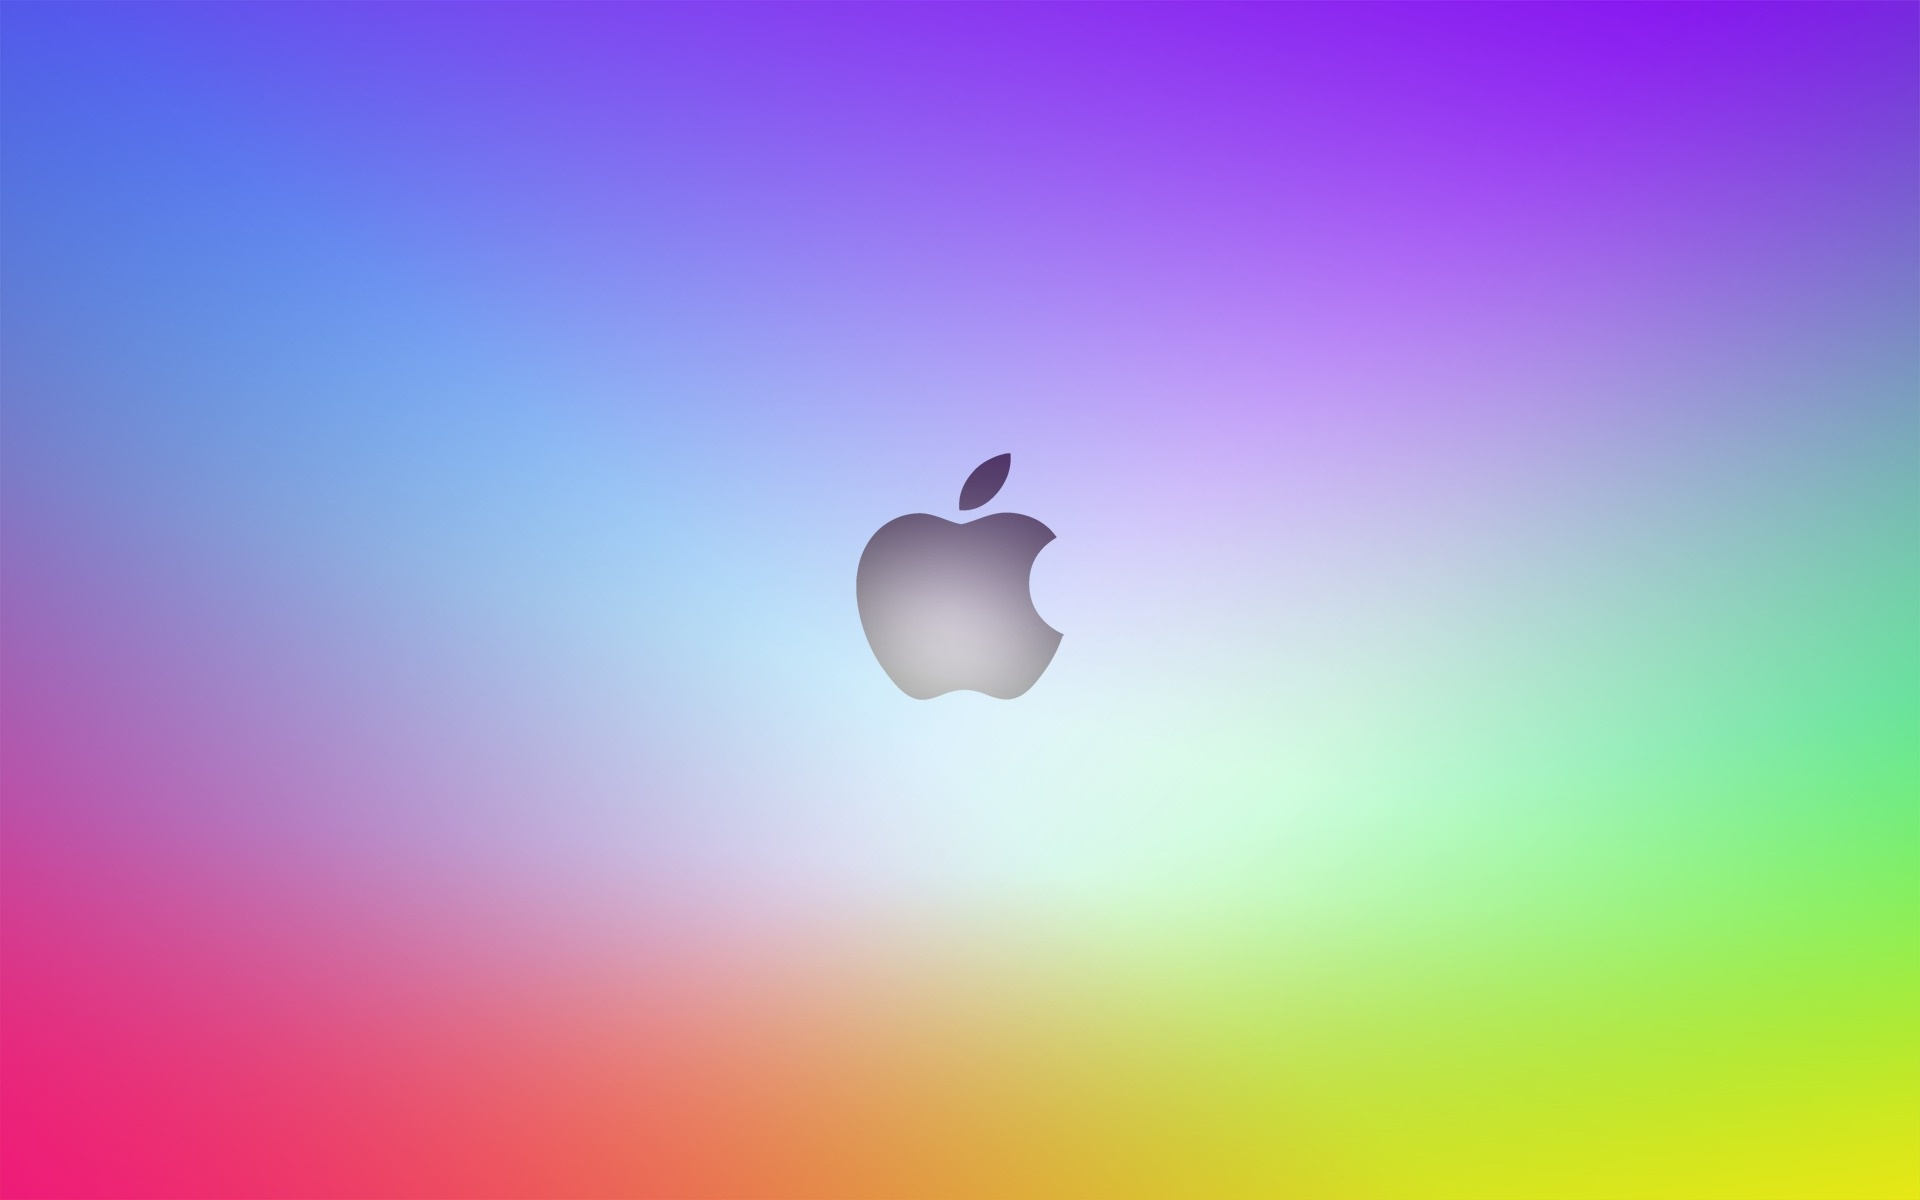 Apple Ios Mountains And Galaxy Hd Desktop Wallpaper Widescreen 1920x1200